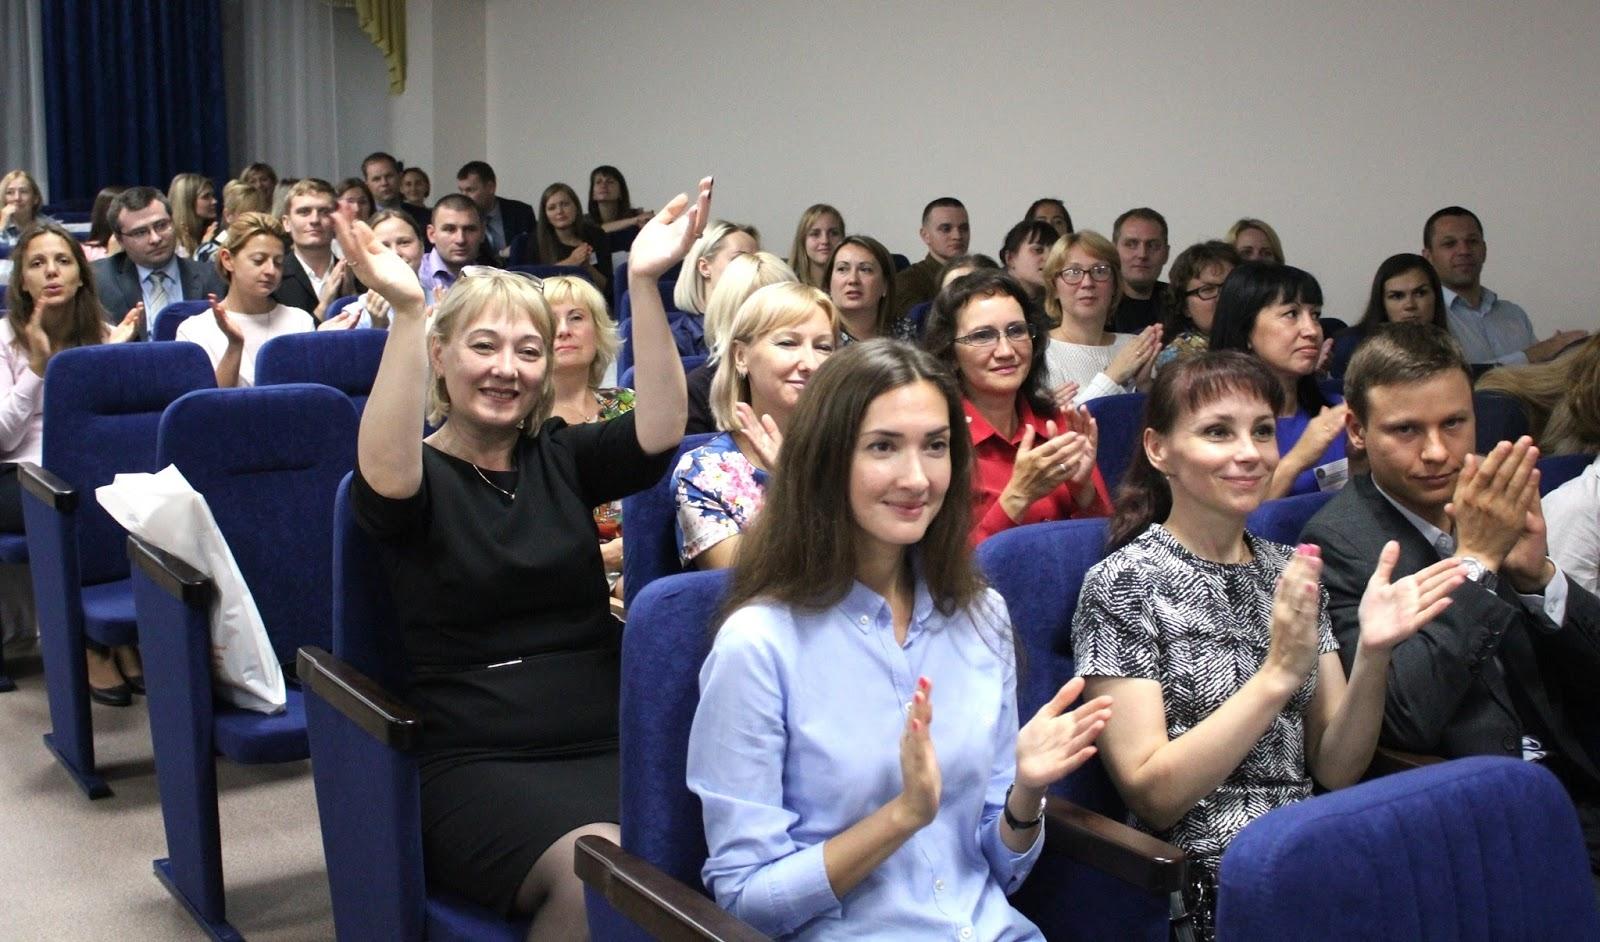 Новости с.мантурово курской области